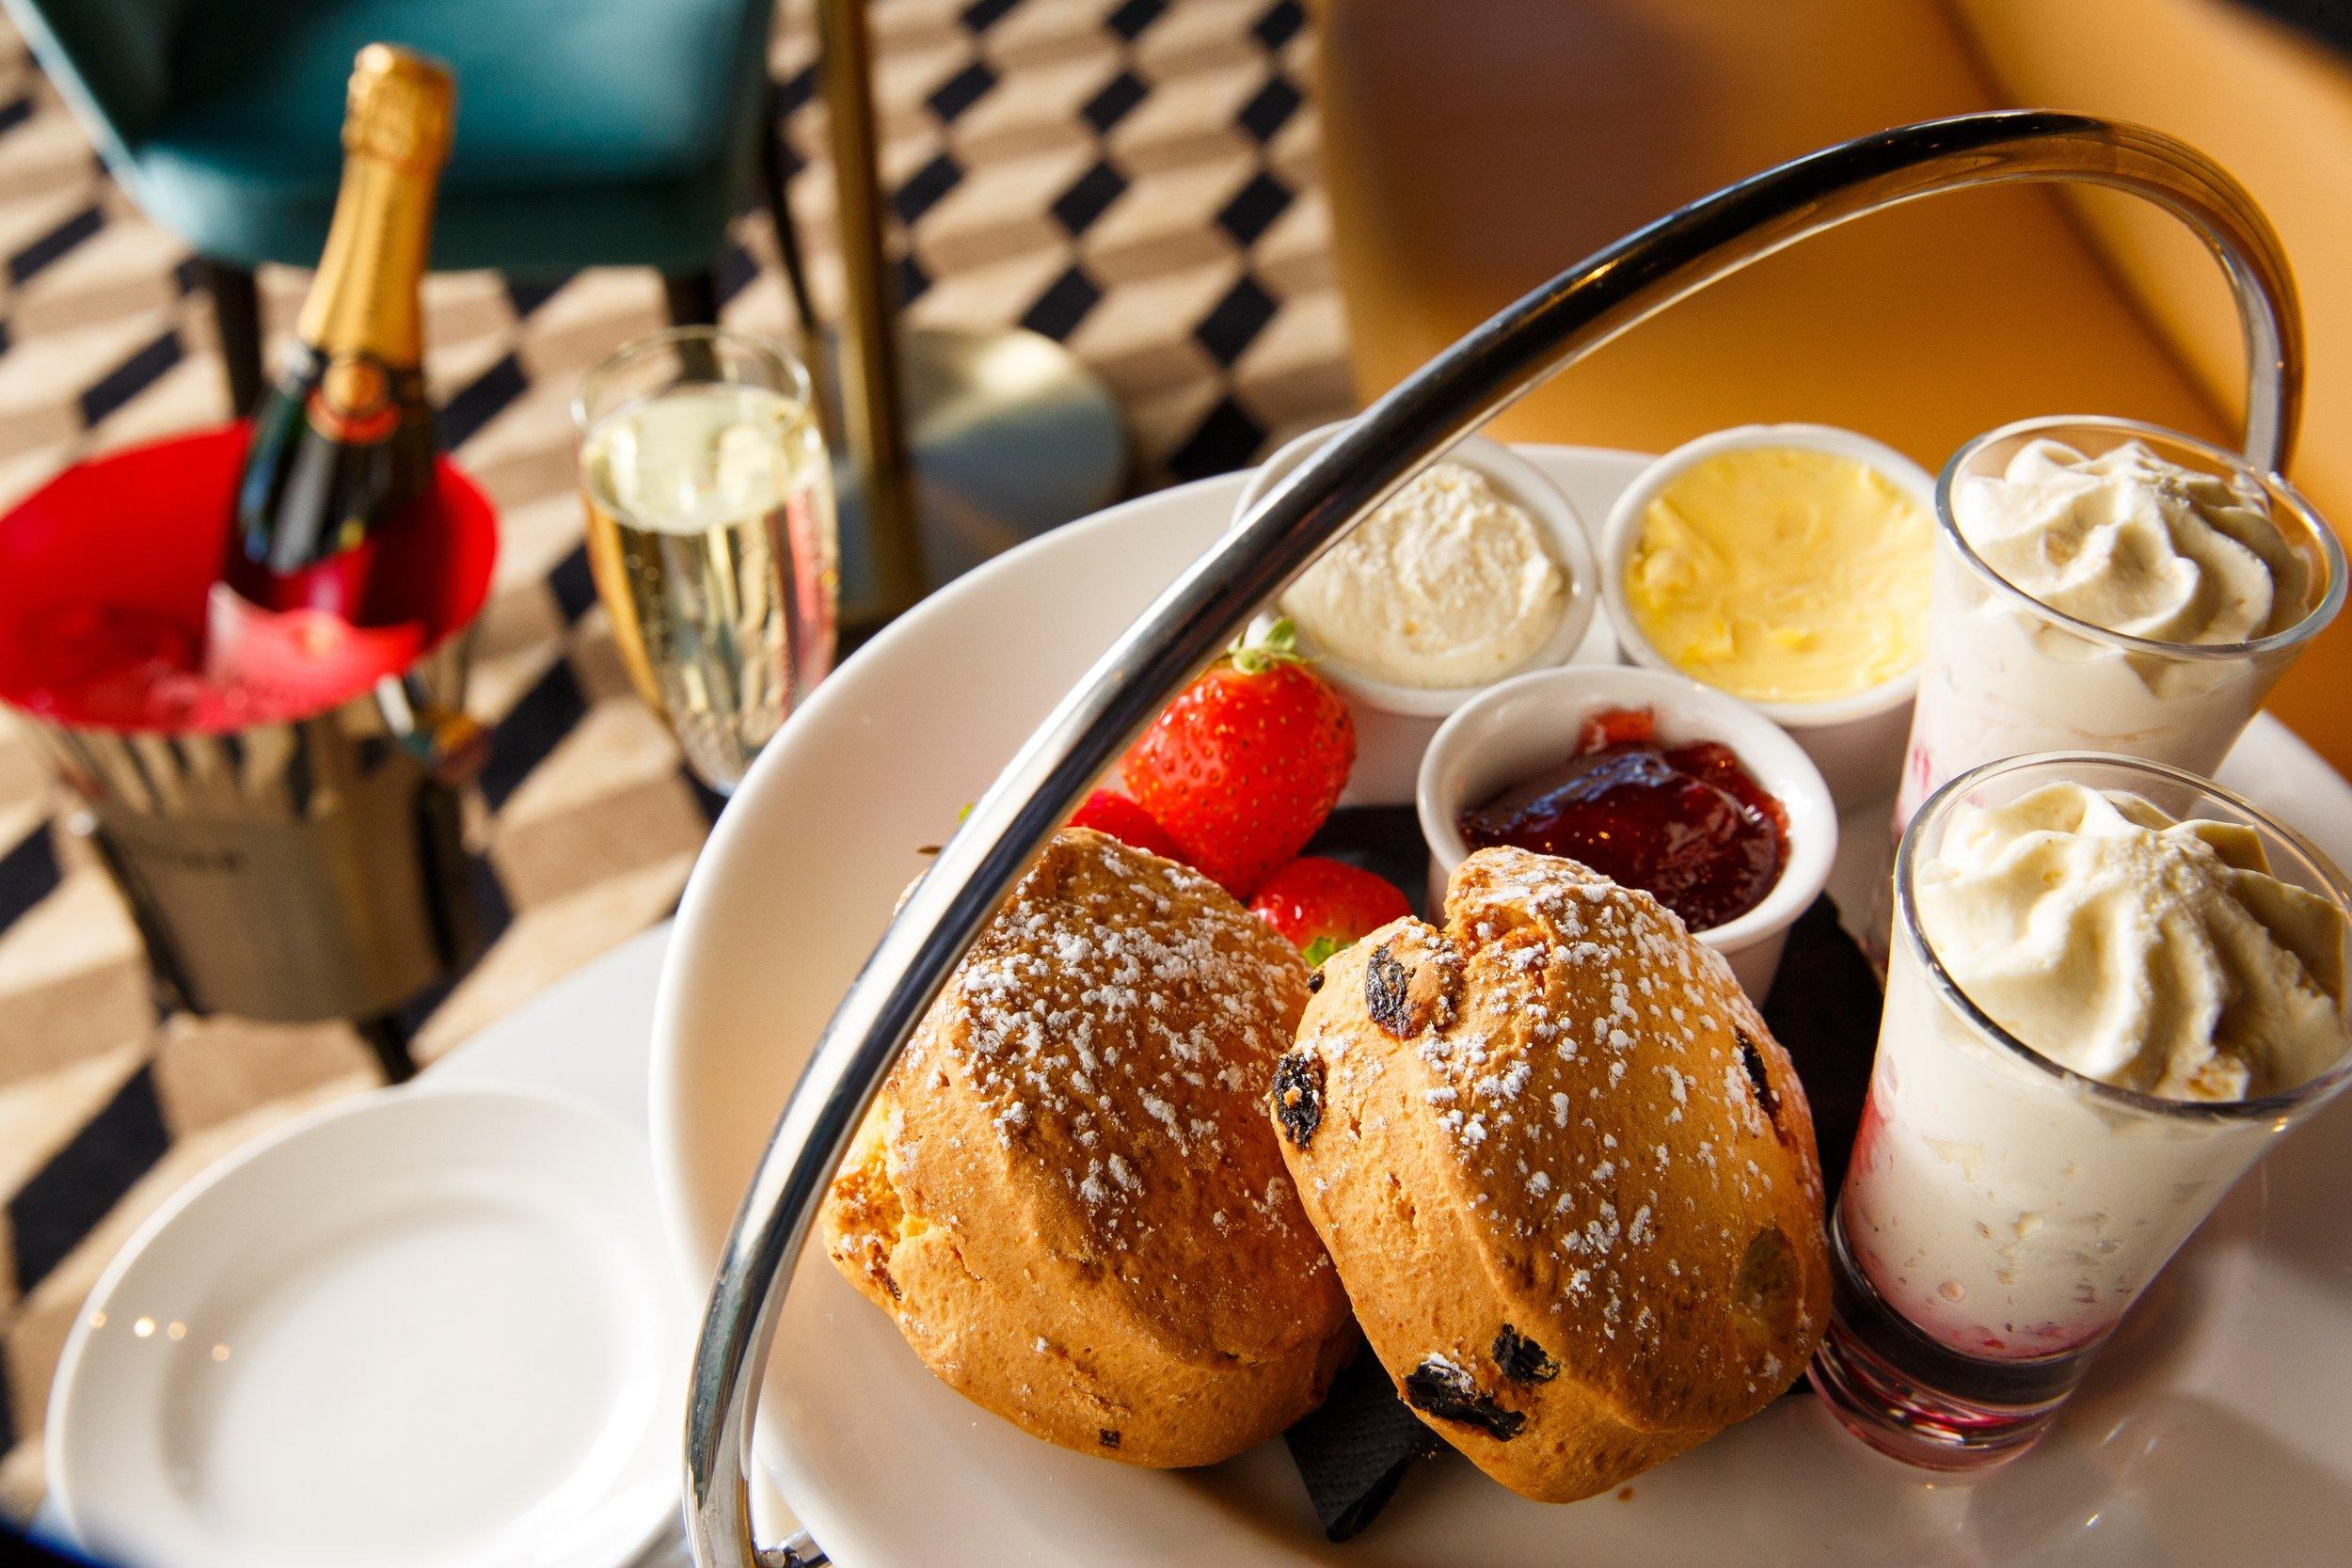 Mercure-Edinburgh-City-Princes-Street-Hotel-Afternoon-Tea-03-lr-230818.jpg